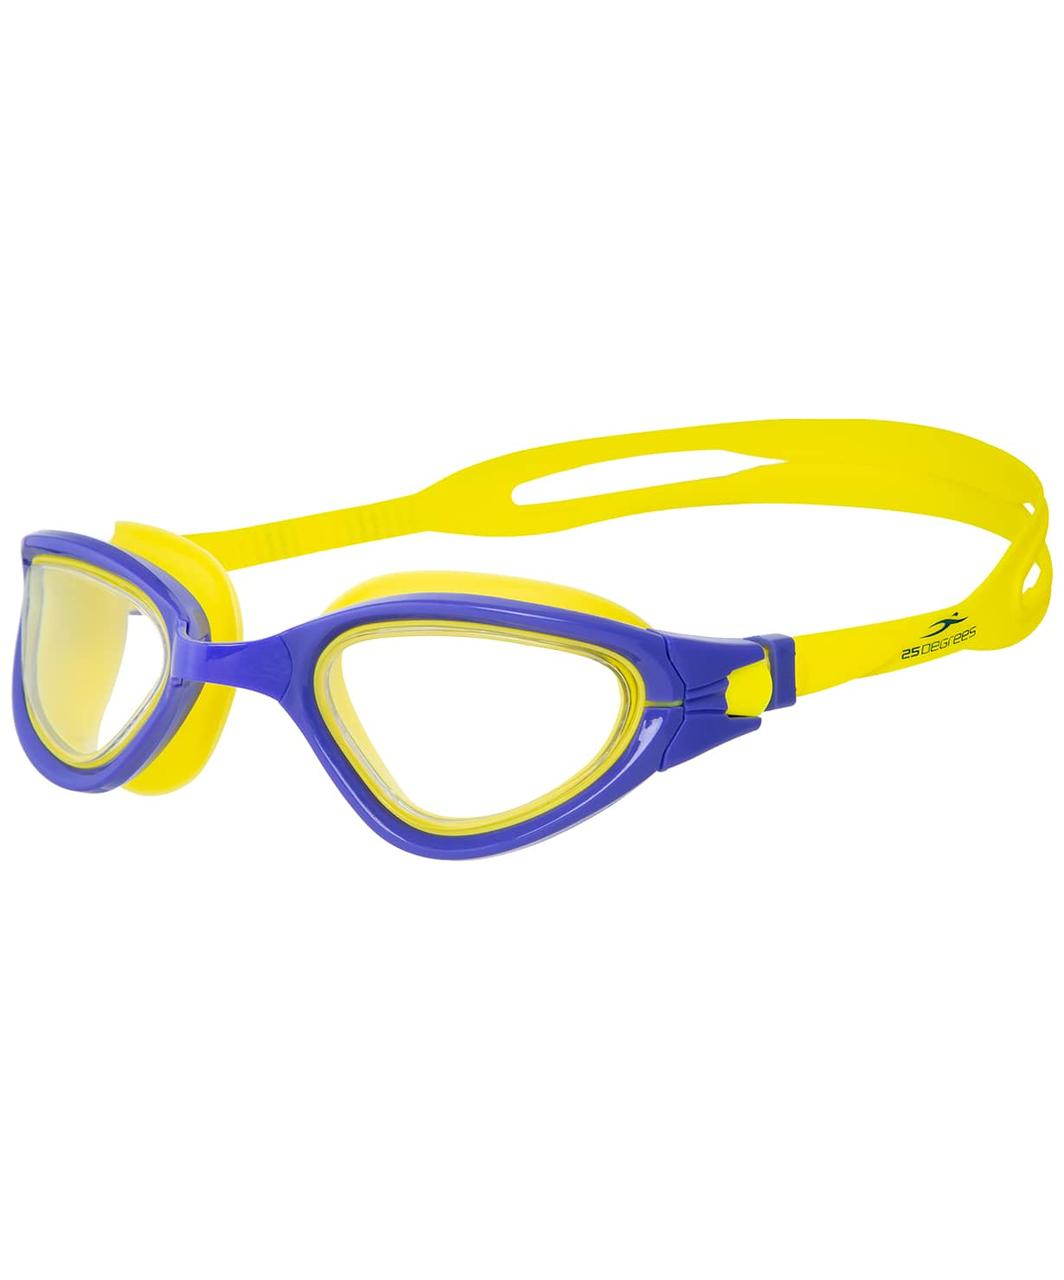 Очки для плавания Azimut Purple/Yellow 25Degrees